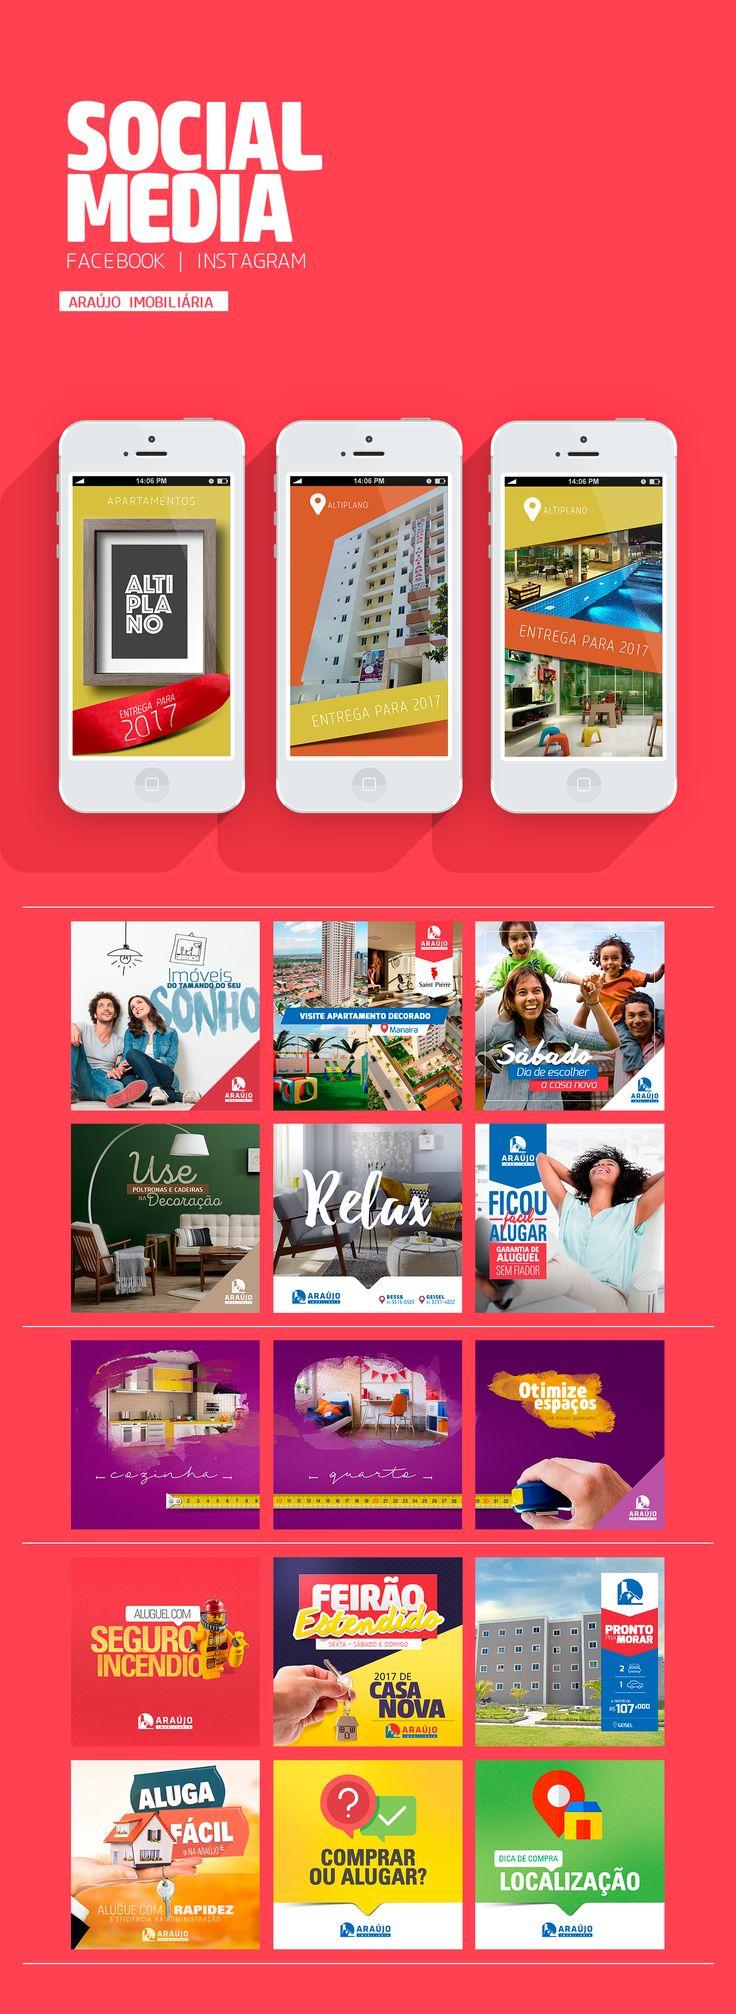 SOCIAL MEDIA | Araújo Imobiliária on Behance